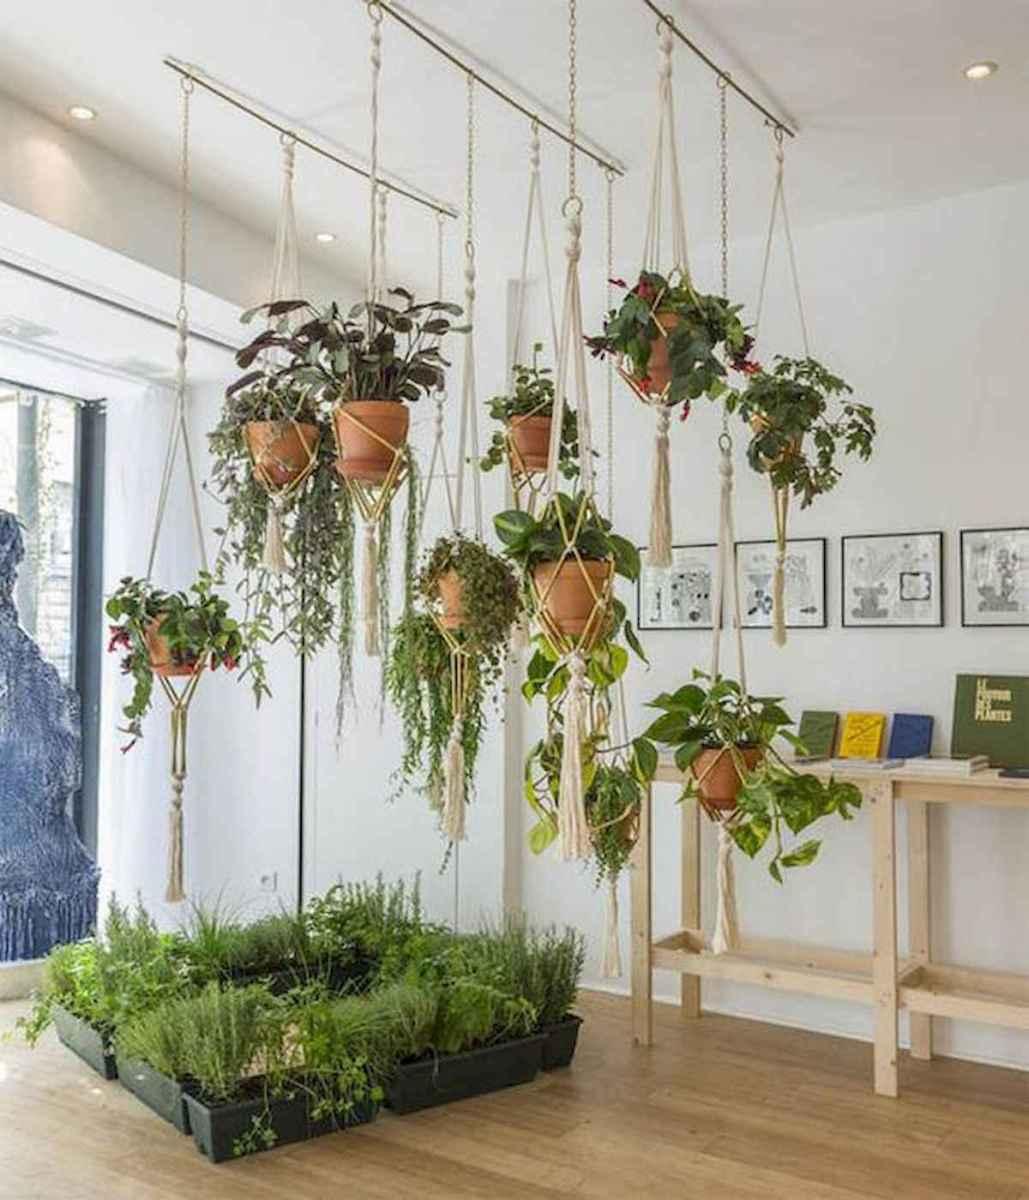 50 Amazing Vertical Garden Design Ideas And Remodel (19)